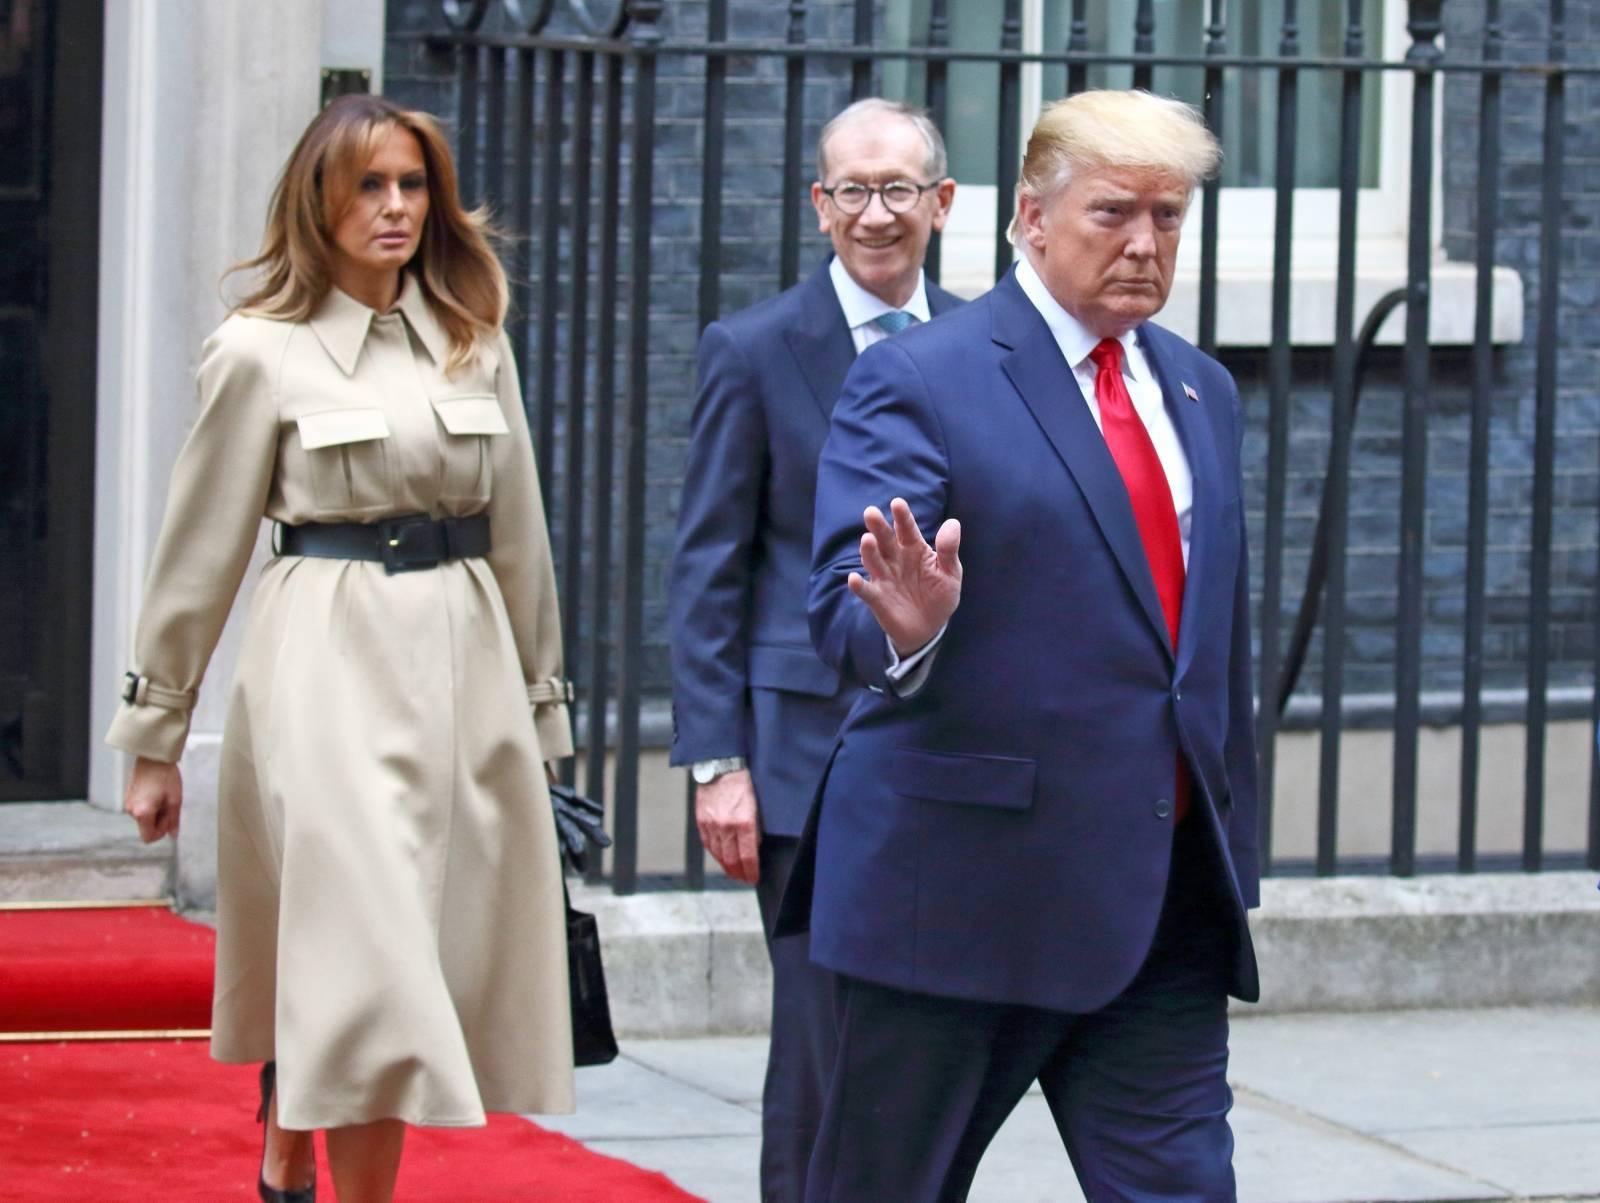 US President Donald Trump State visit